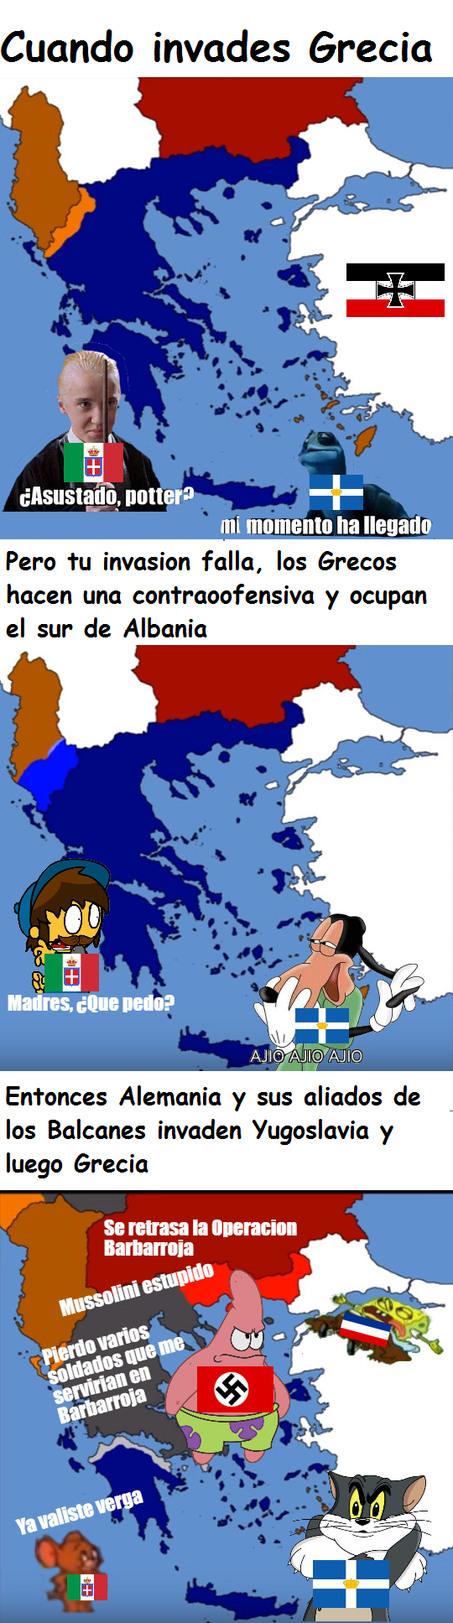 Greco italian guar - meme